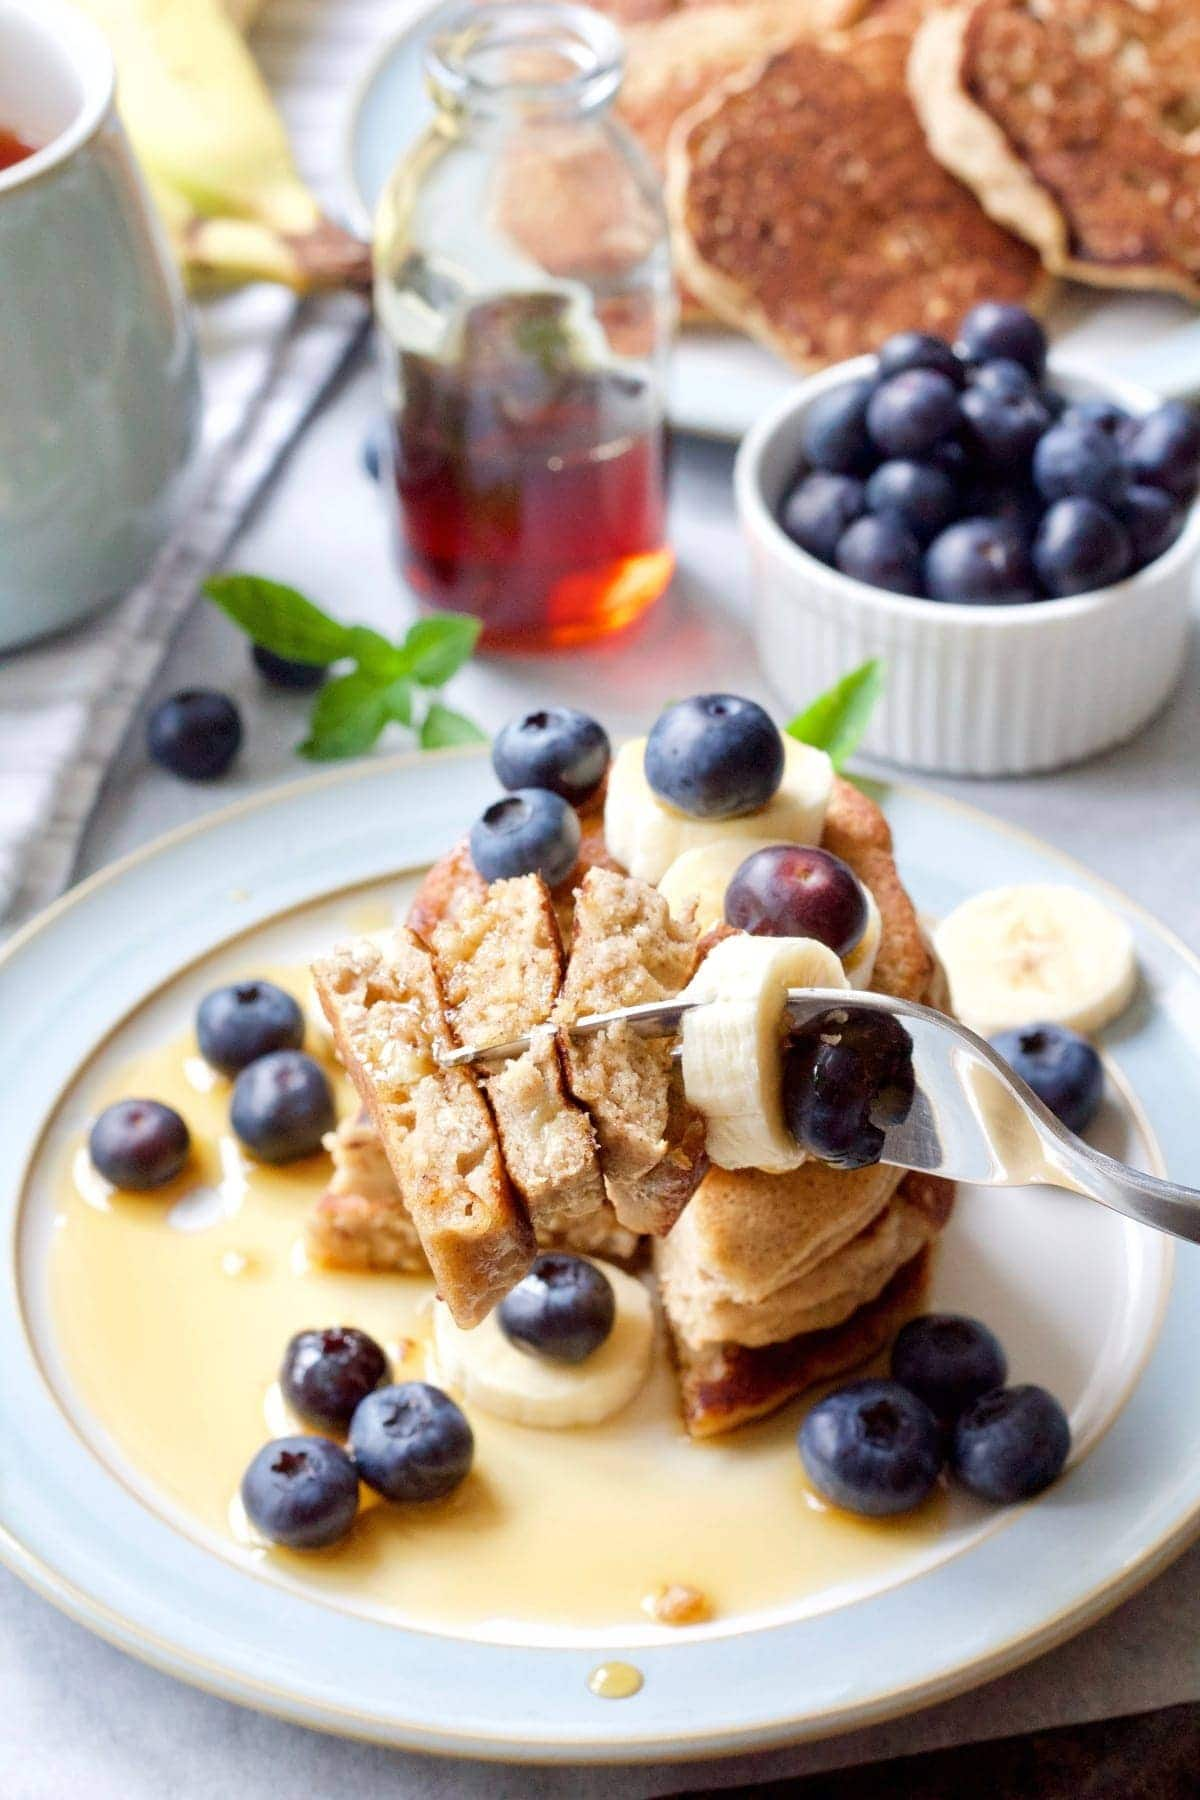 Forkful of pancakes, banana slice & blueberry.